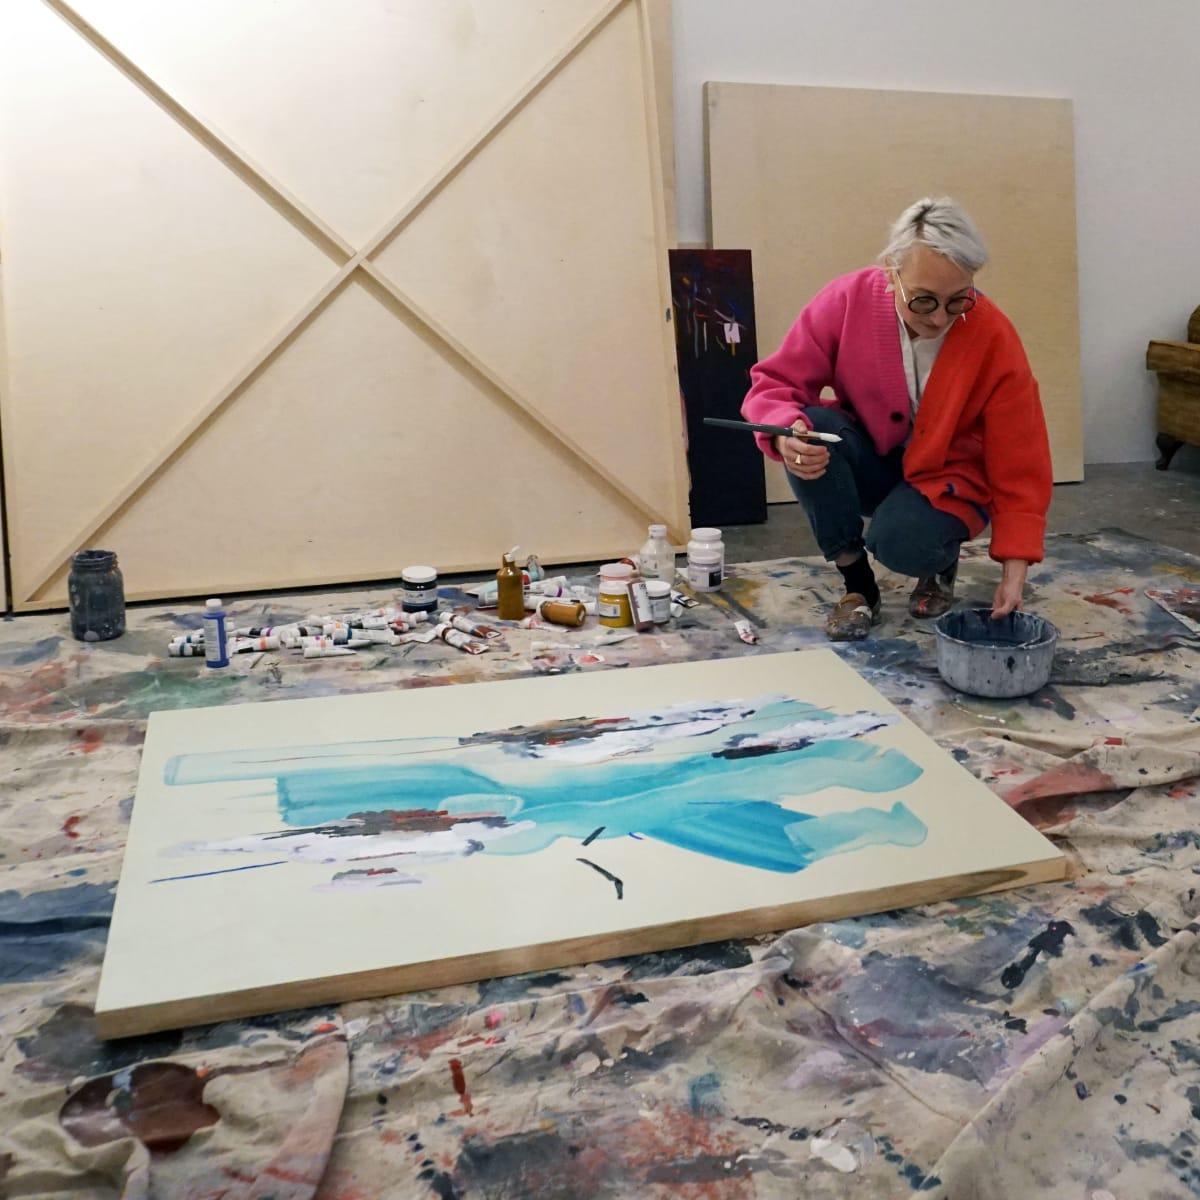 Janna Watson in her studio.